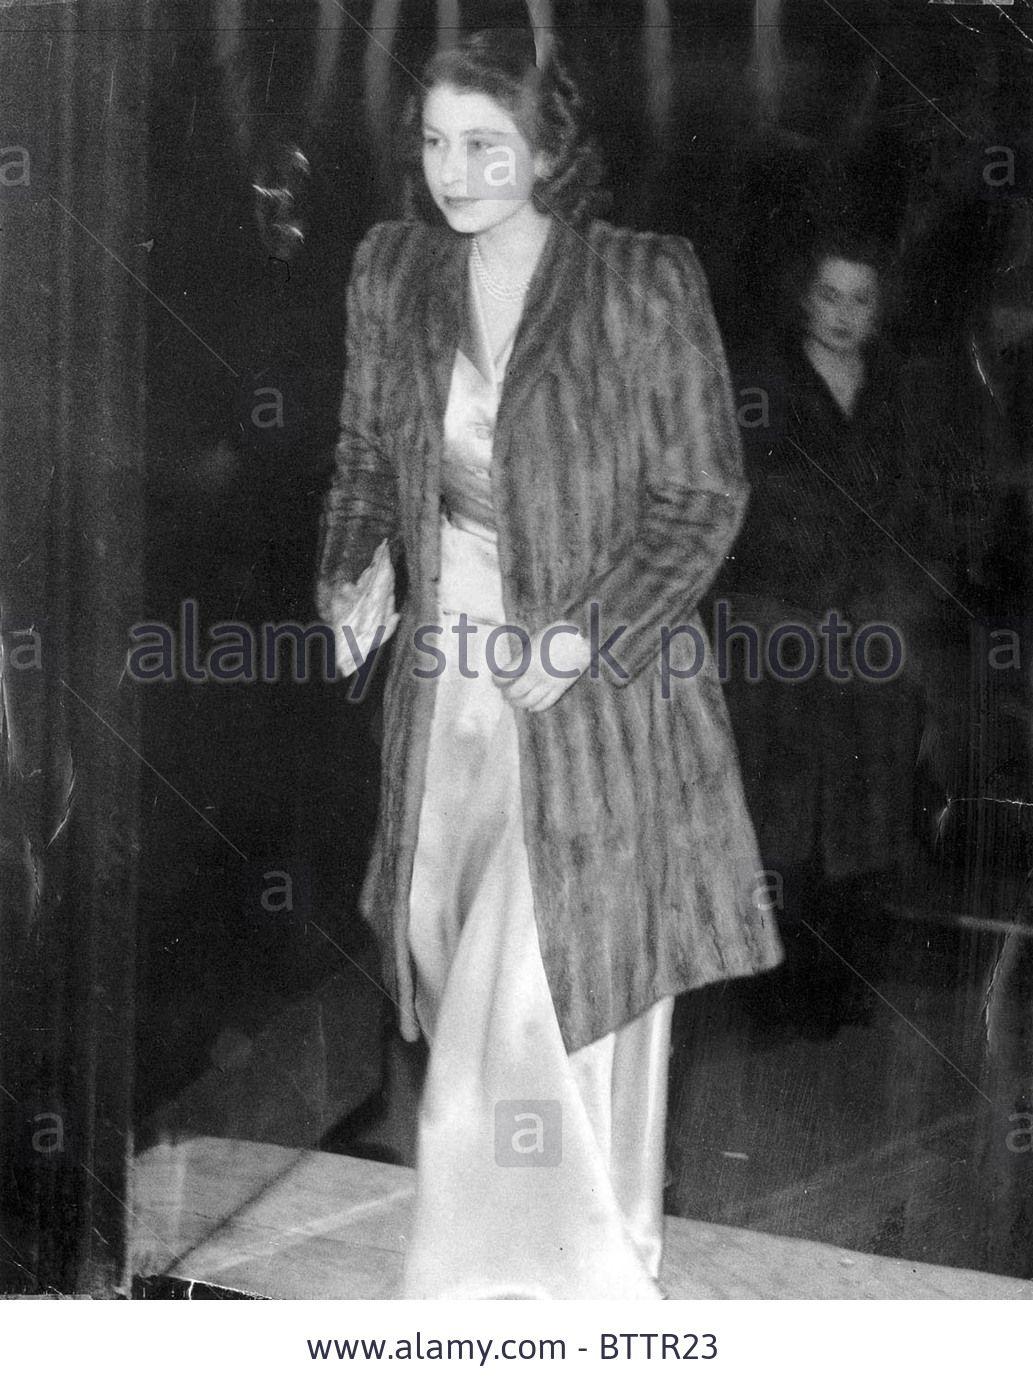 http://c8.alamy.com/comp/BTTR23/fur-coat-clad-princess-arriving-at-ciros-night-princess-elizabeth-BTTR23.jpg